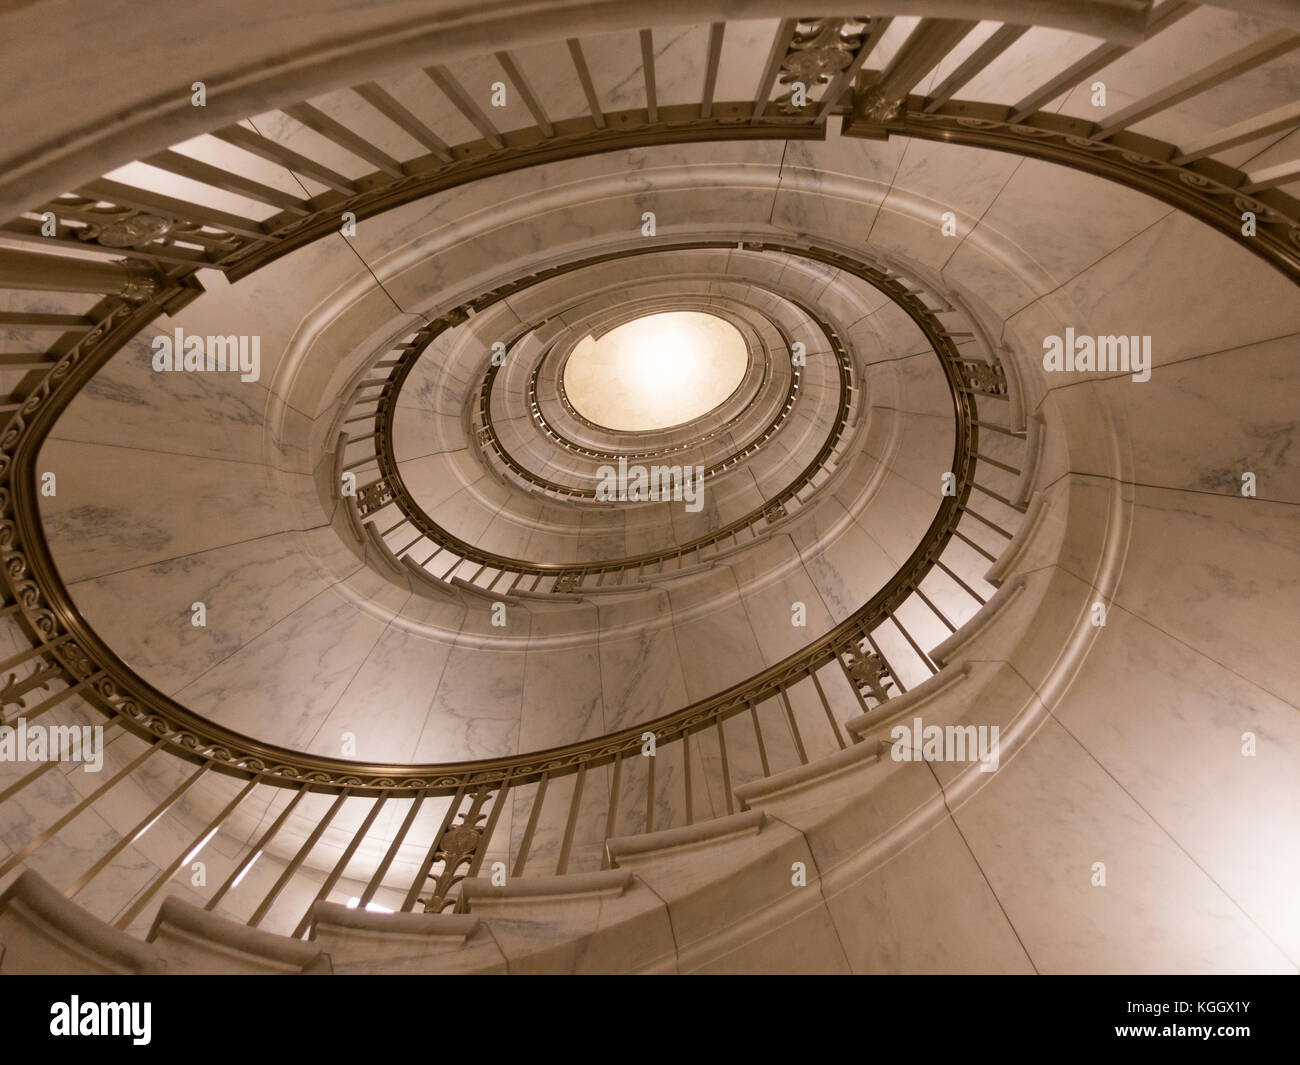 spiral staircase inside the supreme court building washington dc stock photo 165099479 alamy. Black Bedroom Furniture Sets. Home Design Ideas